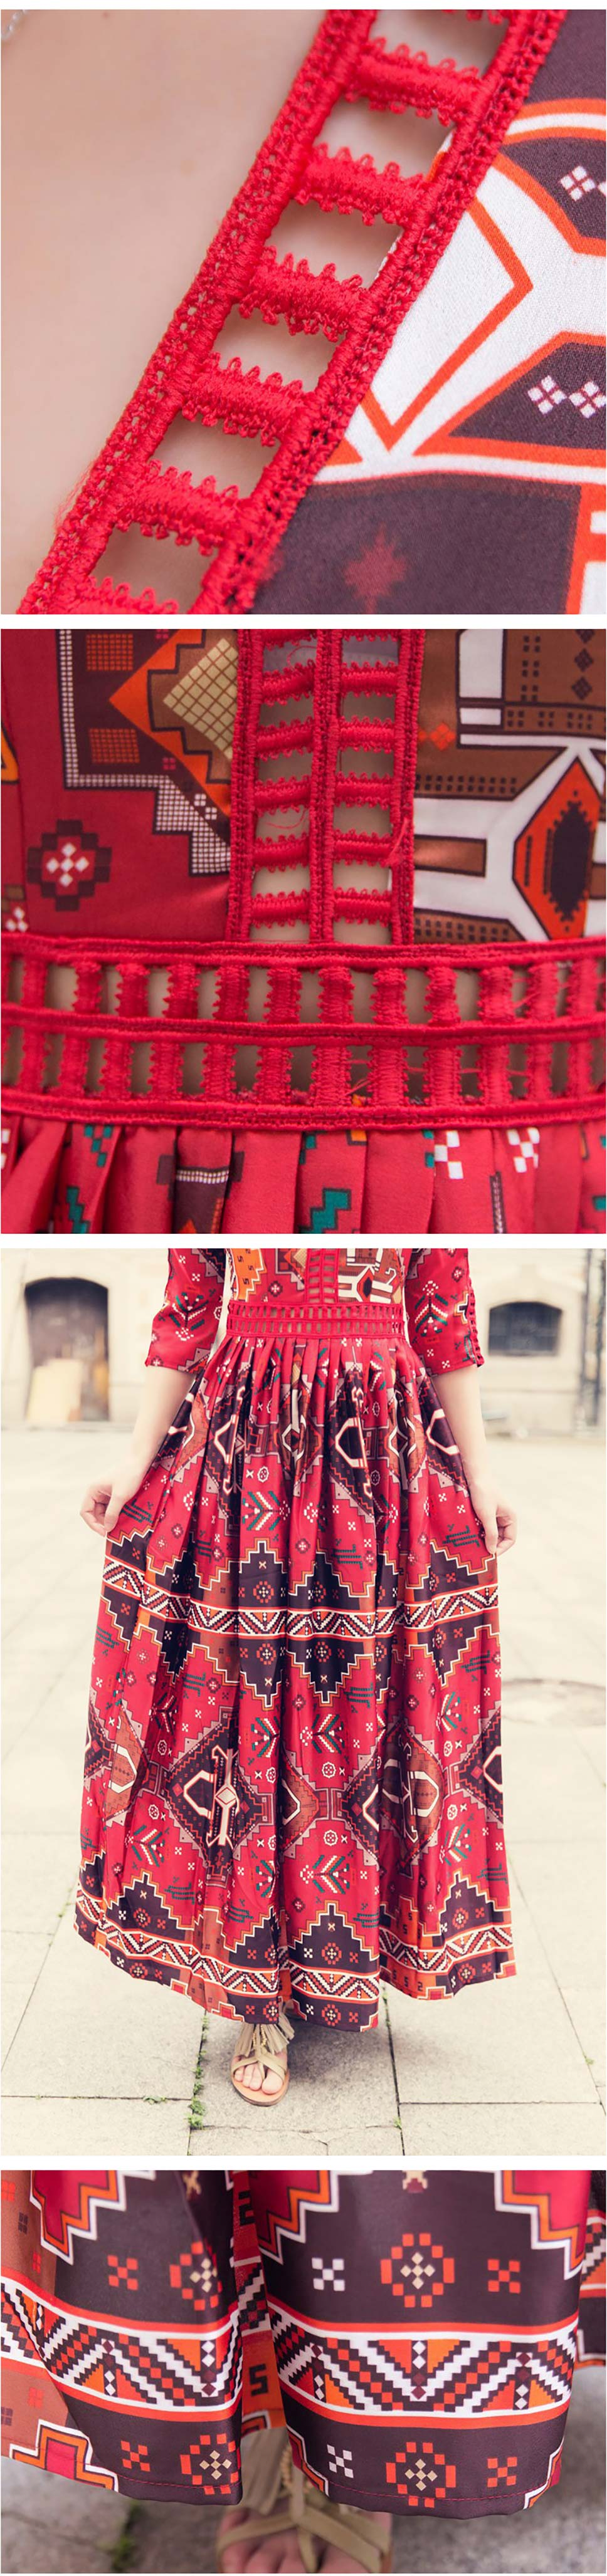 60c081b9b34f Bohemia Print Deep V-Neck Hollow Out Ankle Length Dress Retro High ...